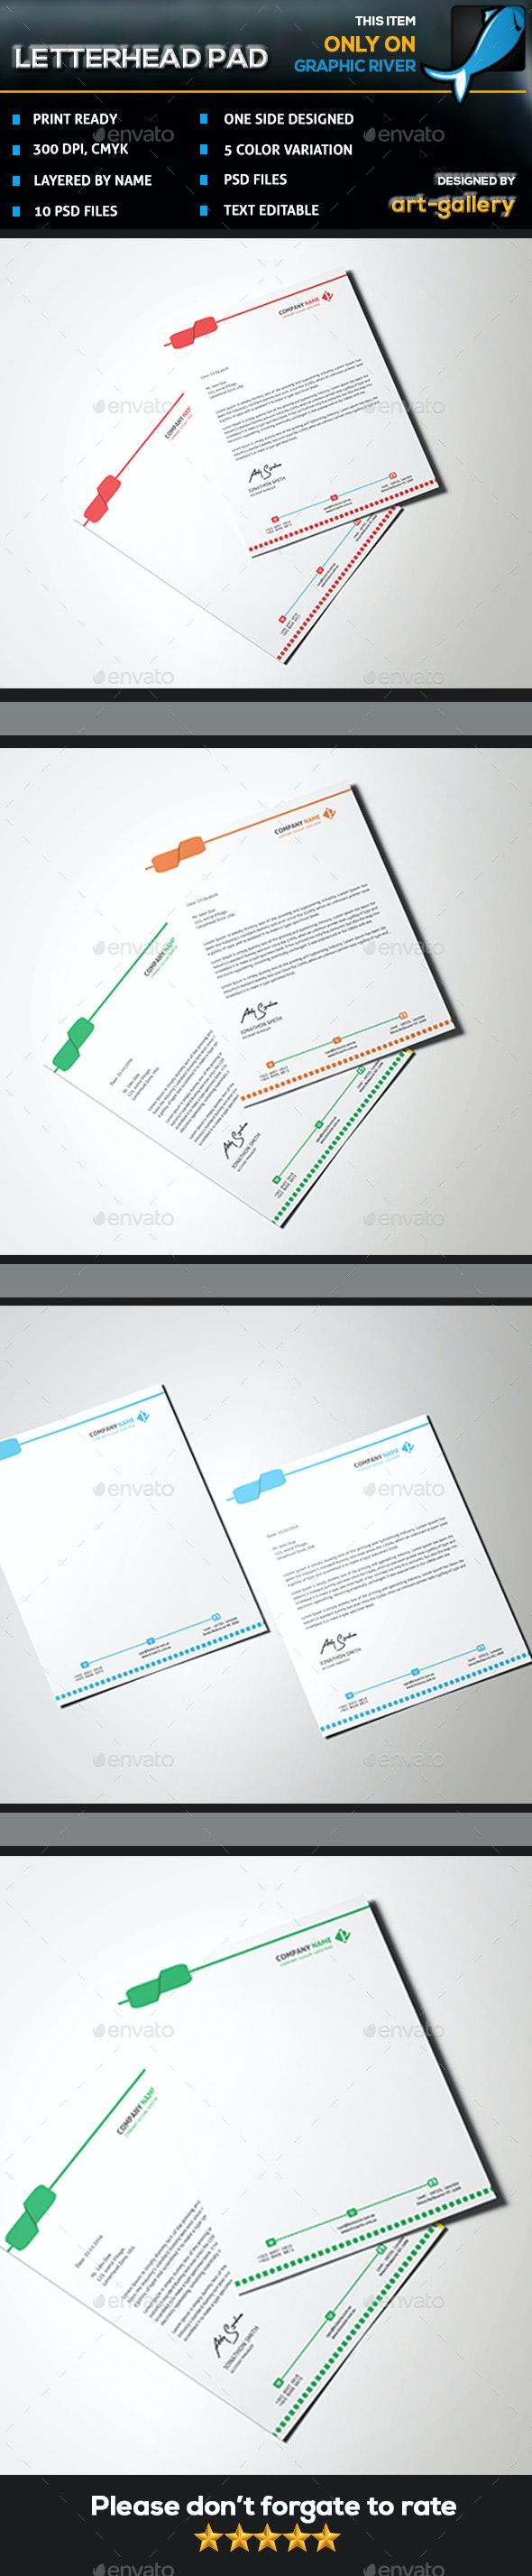 Letterhead L5 - Stationery Print Templates